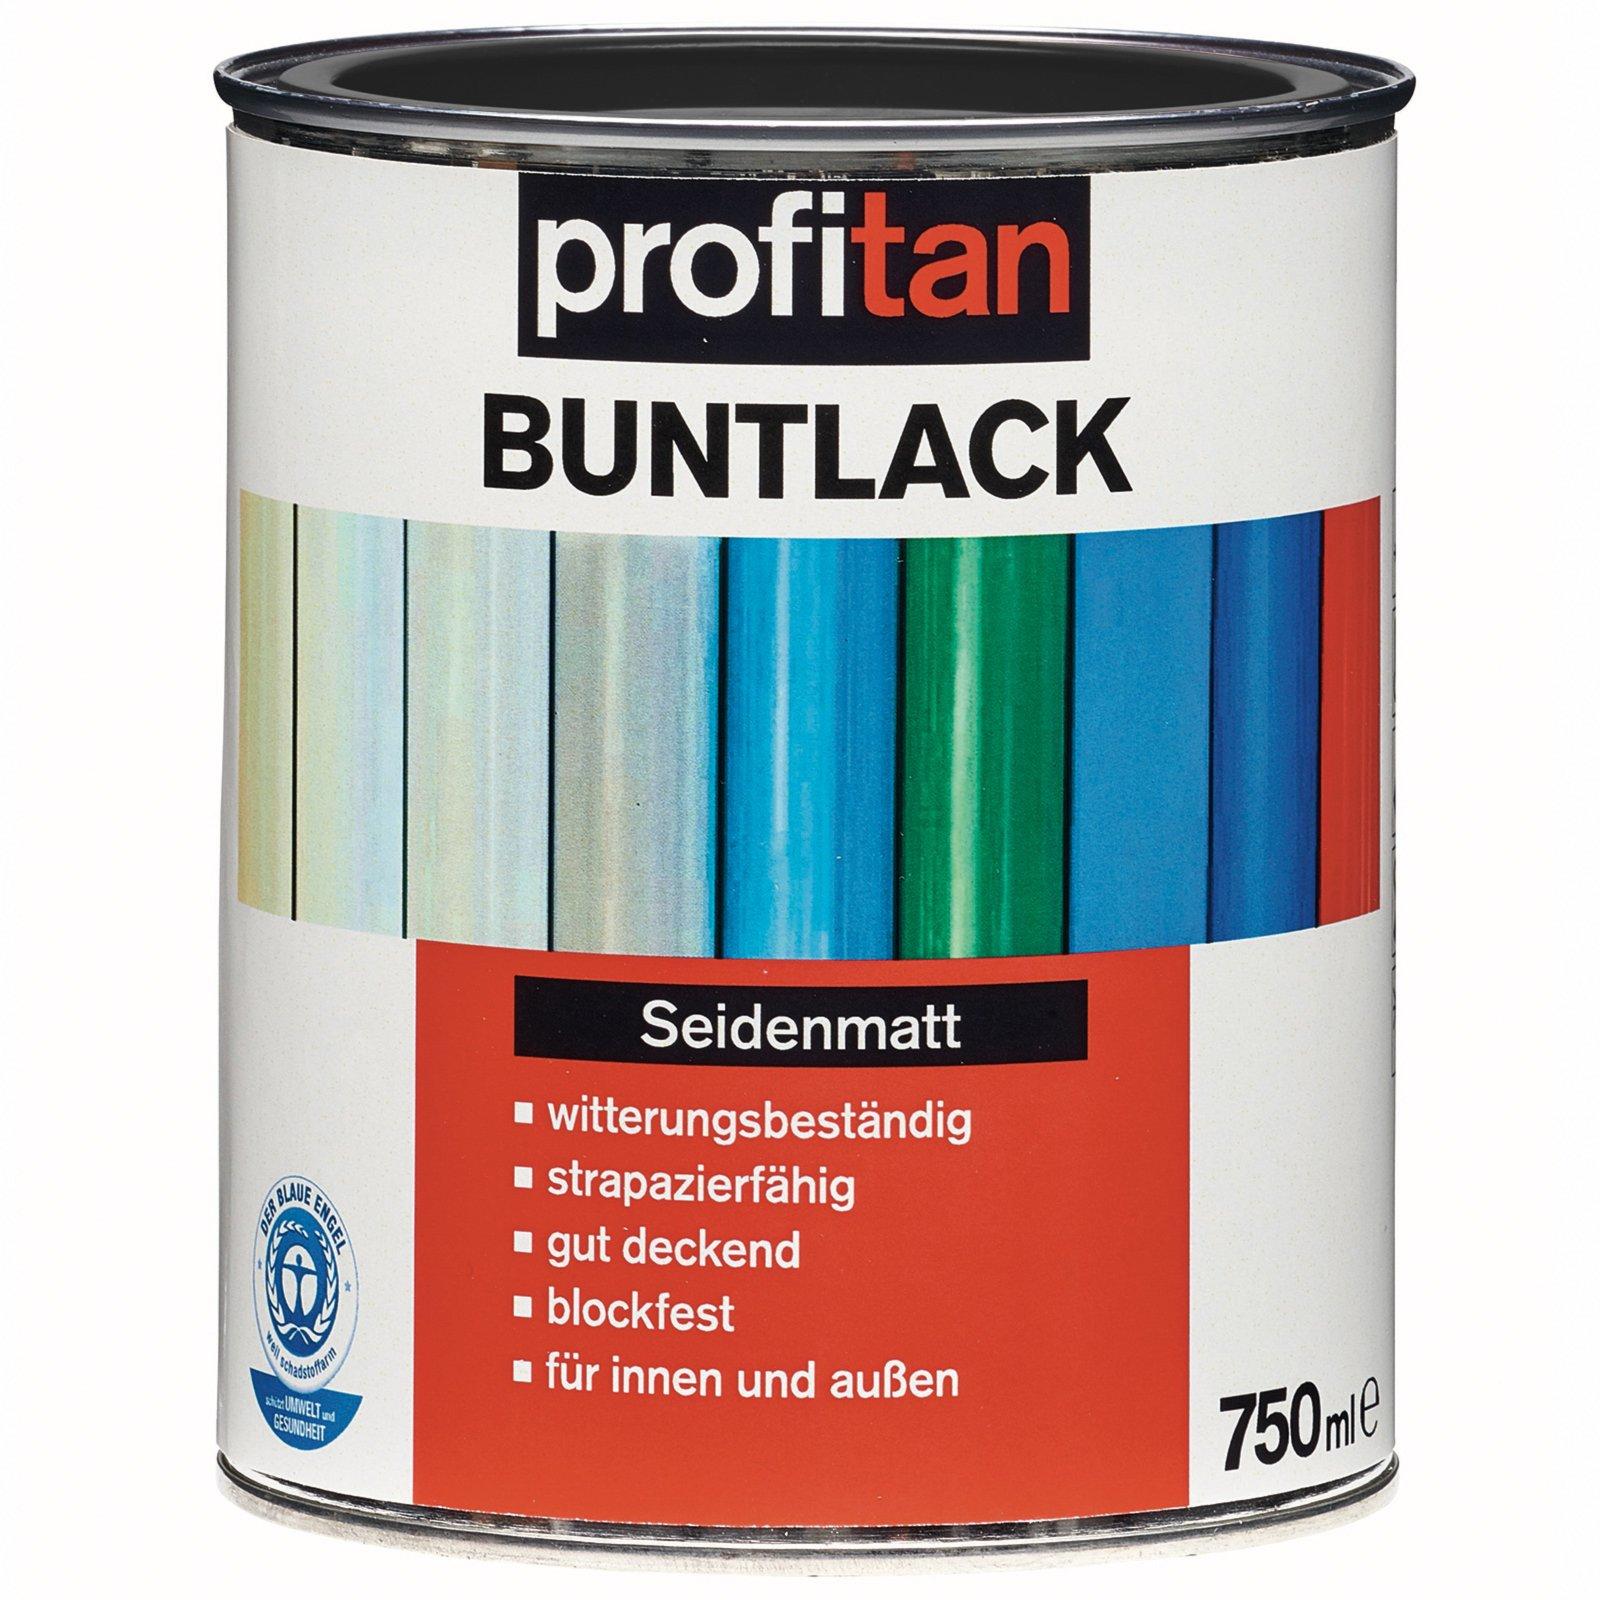 profitan Buntlack - tiefschwarz seidenmatt - 750 ml